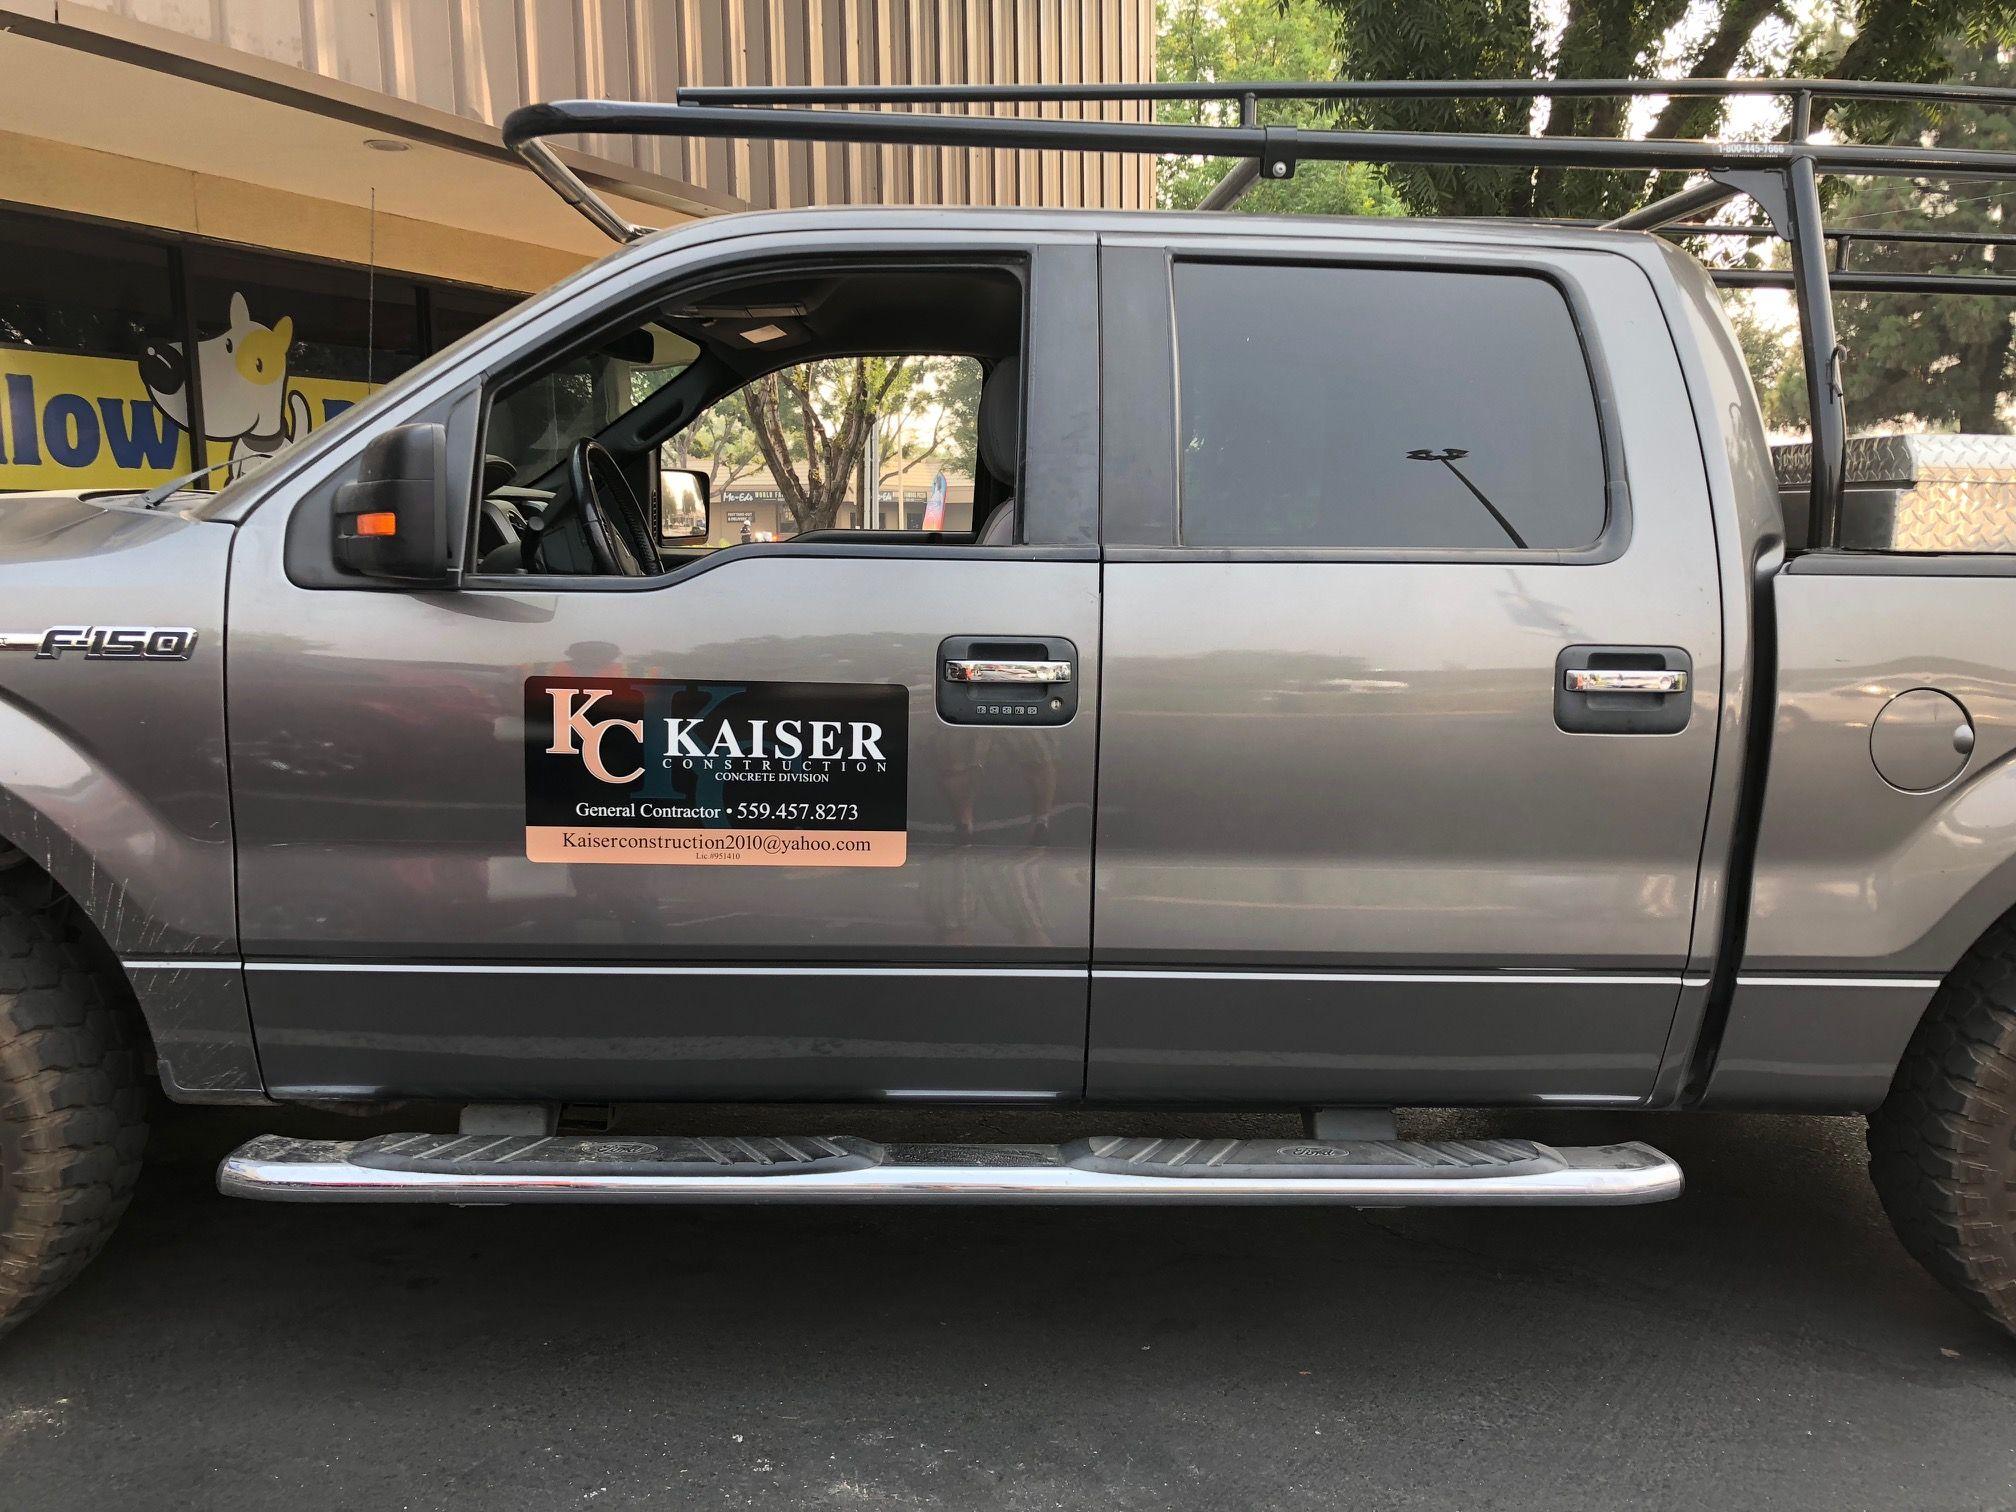 Kaiser Construction